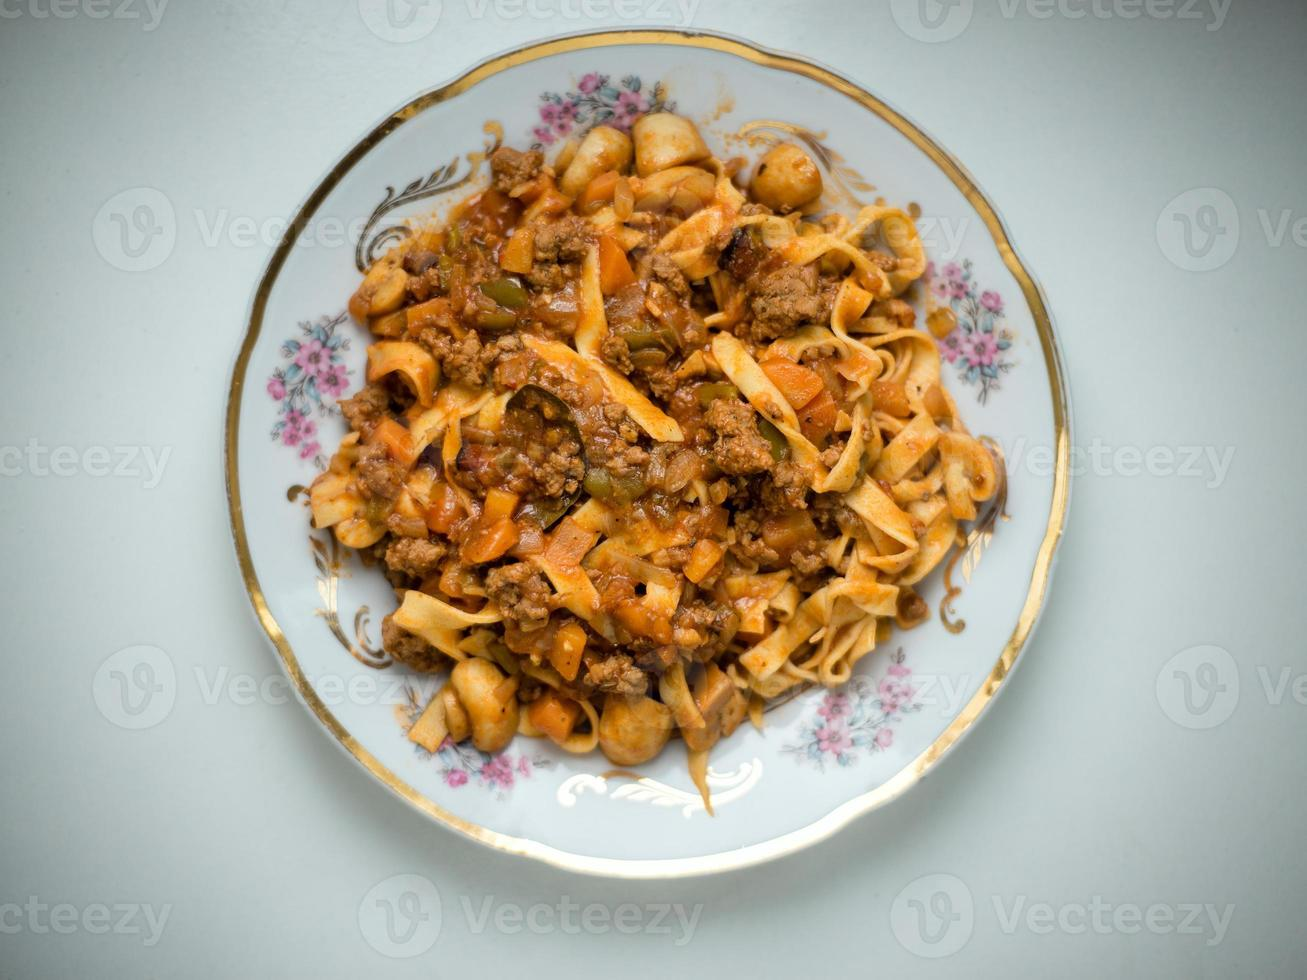 Home made pasta photo